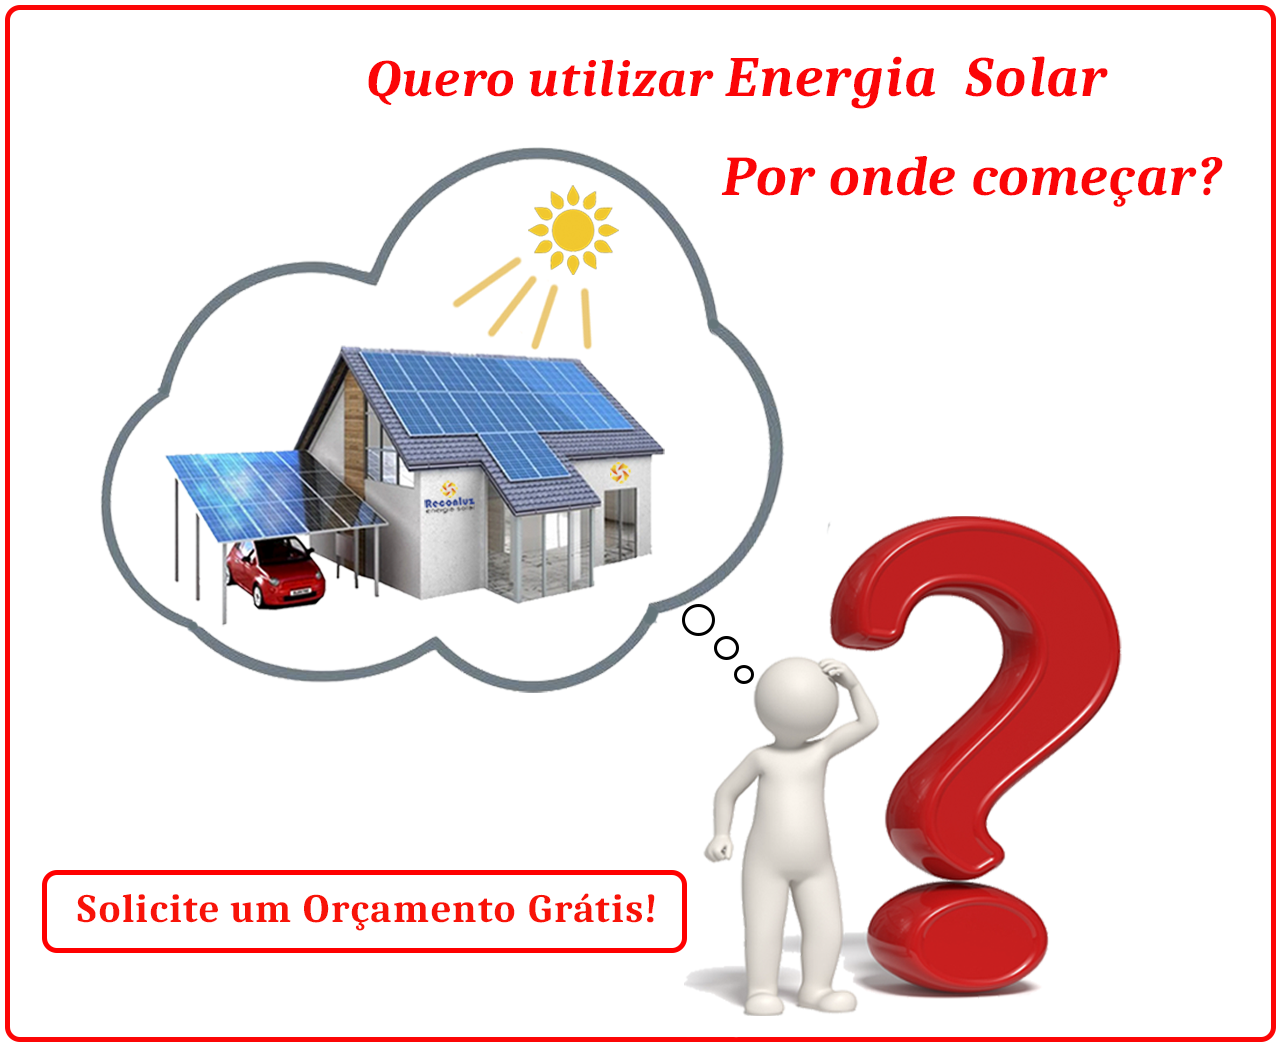 Por onde começar - Reconluz Energia Solar Salvador Bahia